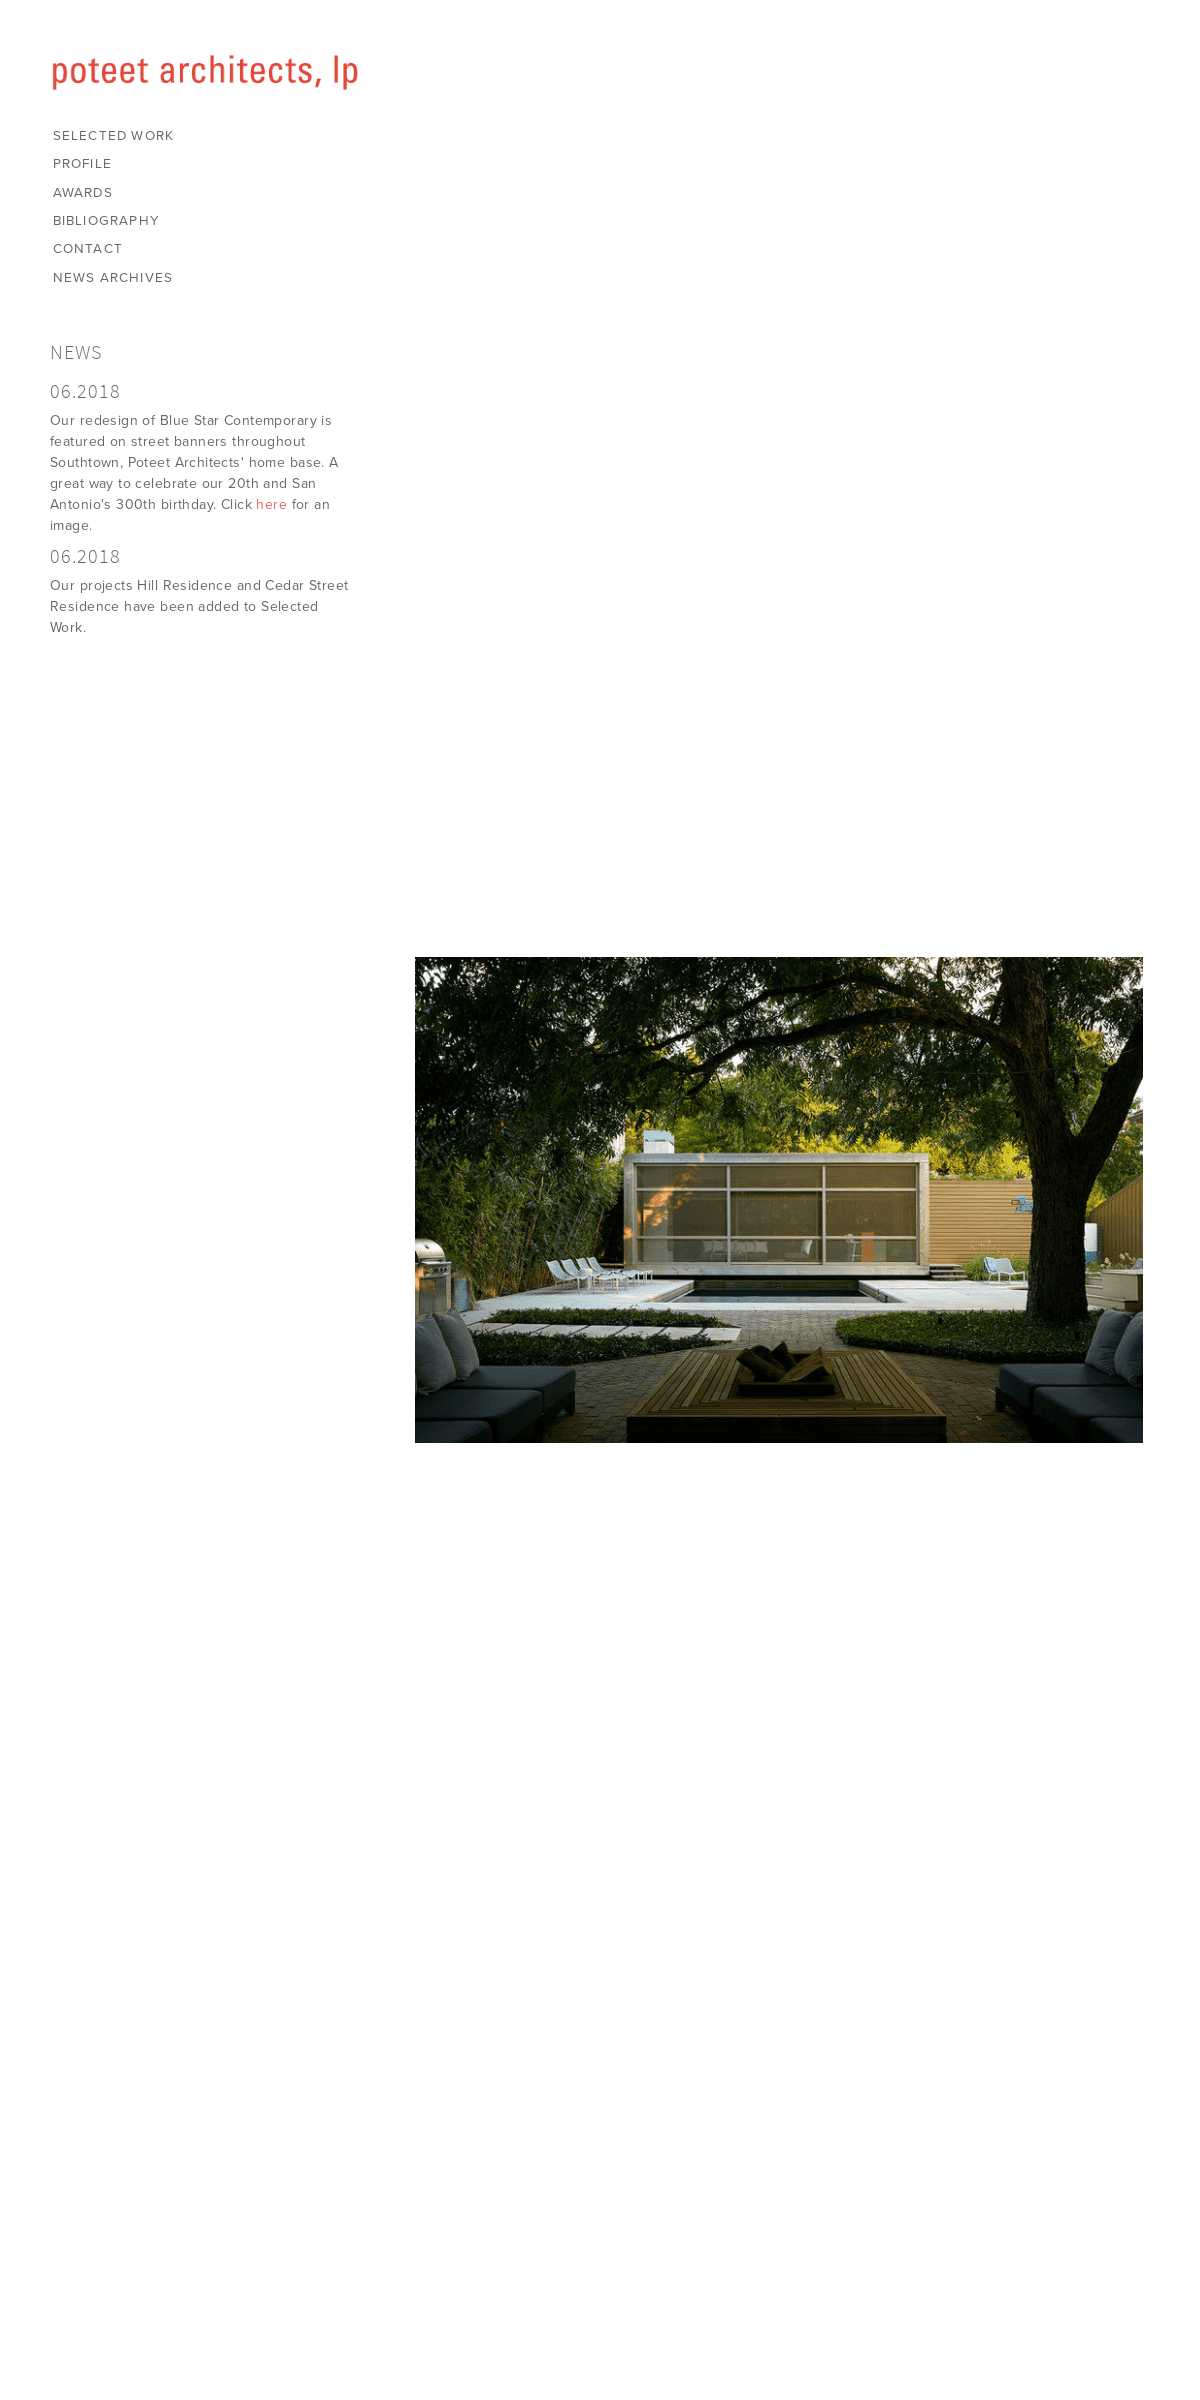 poteet architects, lp